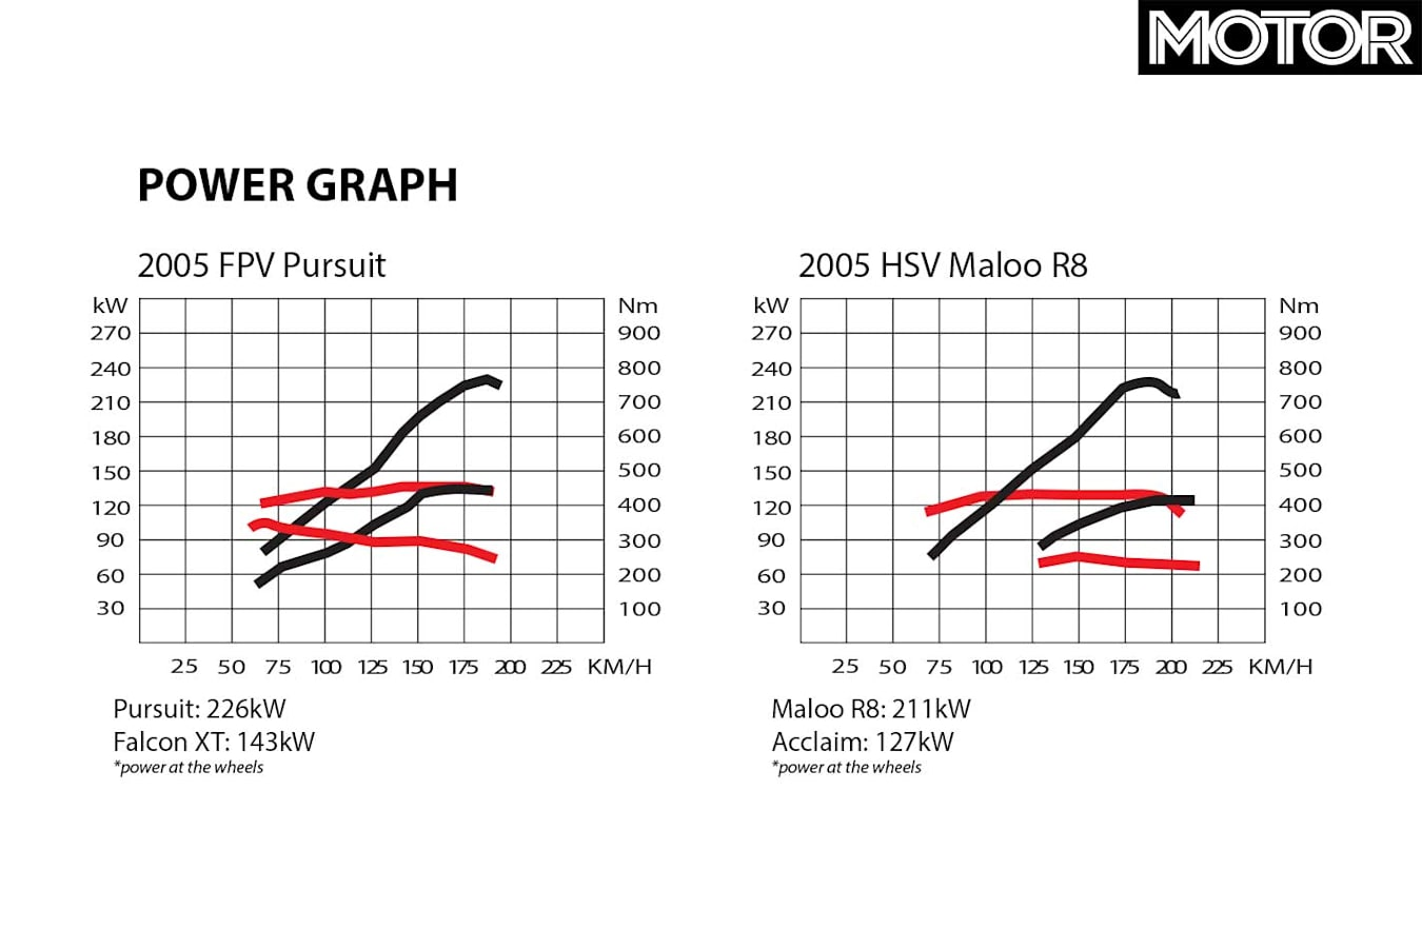 All Aussie Showdown 2005 HSV Maloo R 8 Vs FPV Pursuit Power Graph Jpg